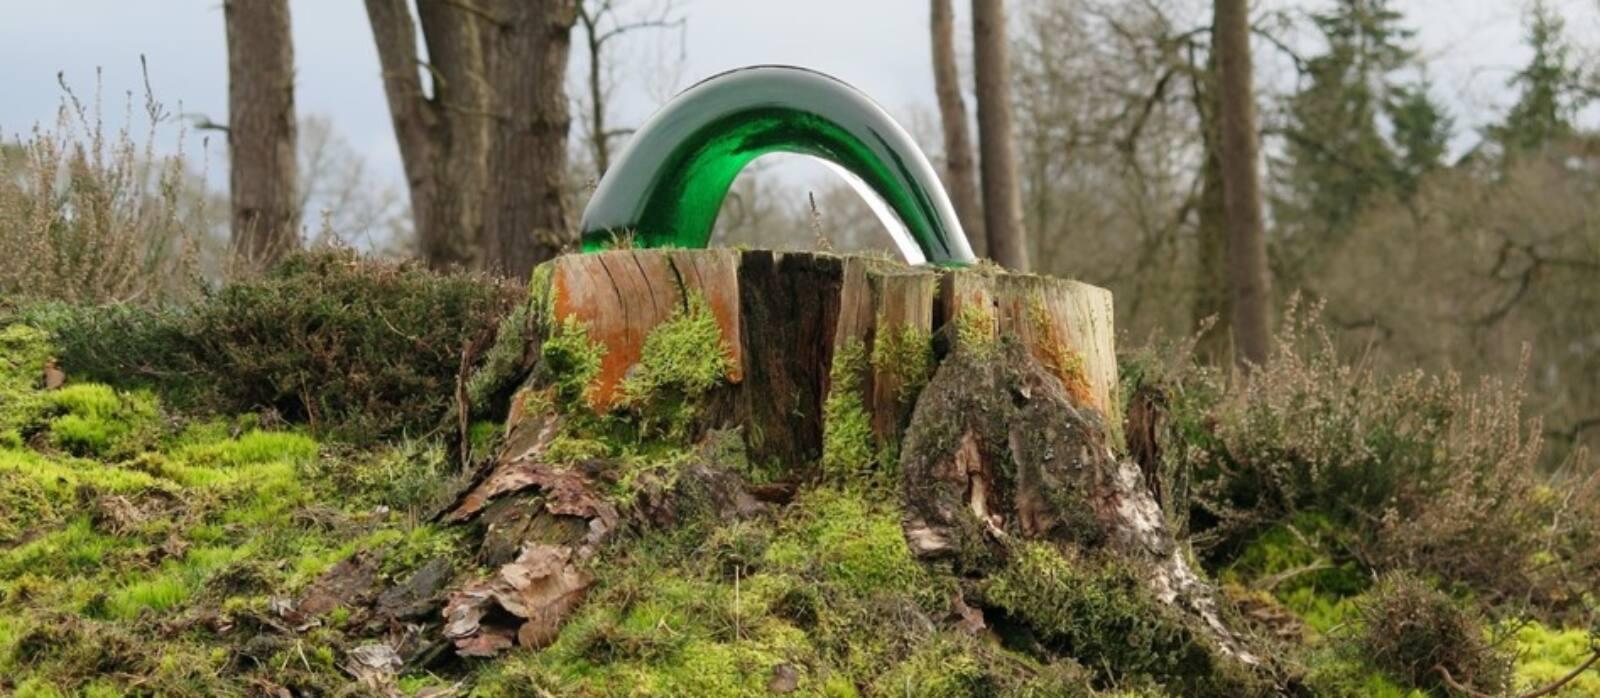 Green Line by Irina Prolygina